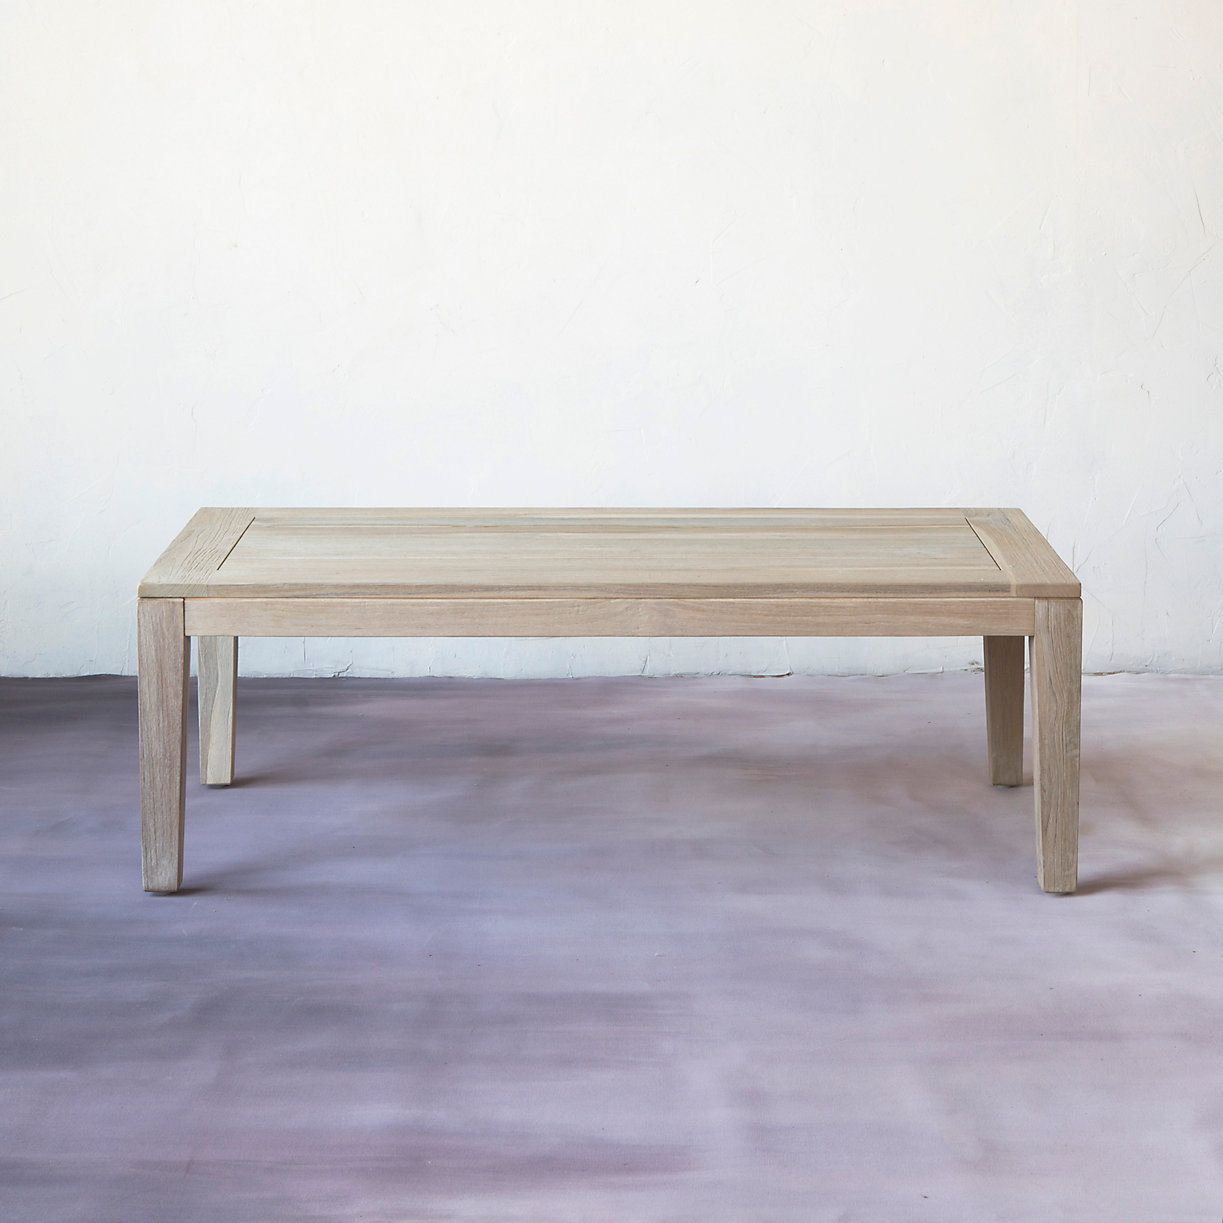 Slatted teak coffee table entertaining outdoor living and teak slatted teak coffee table geotapseo Choice Image